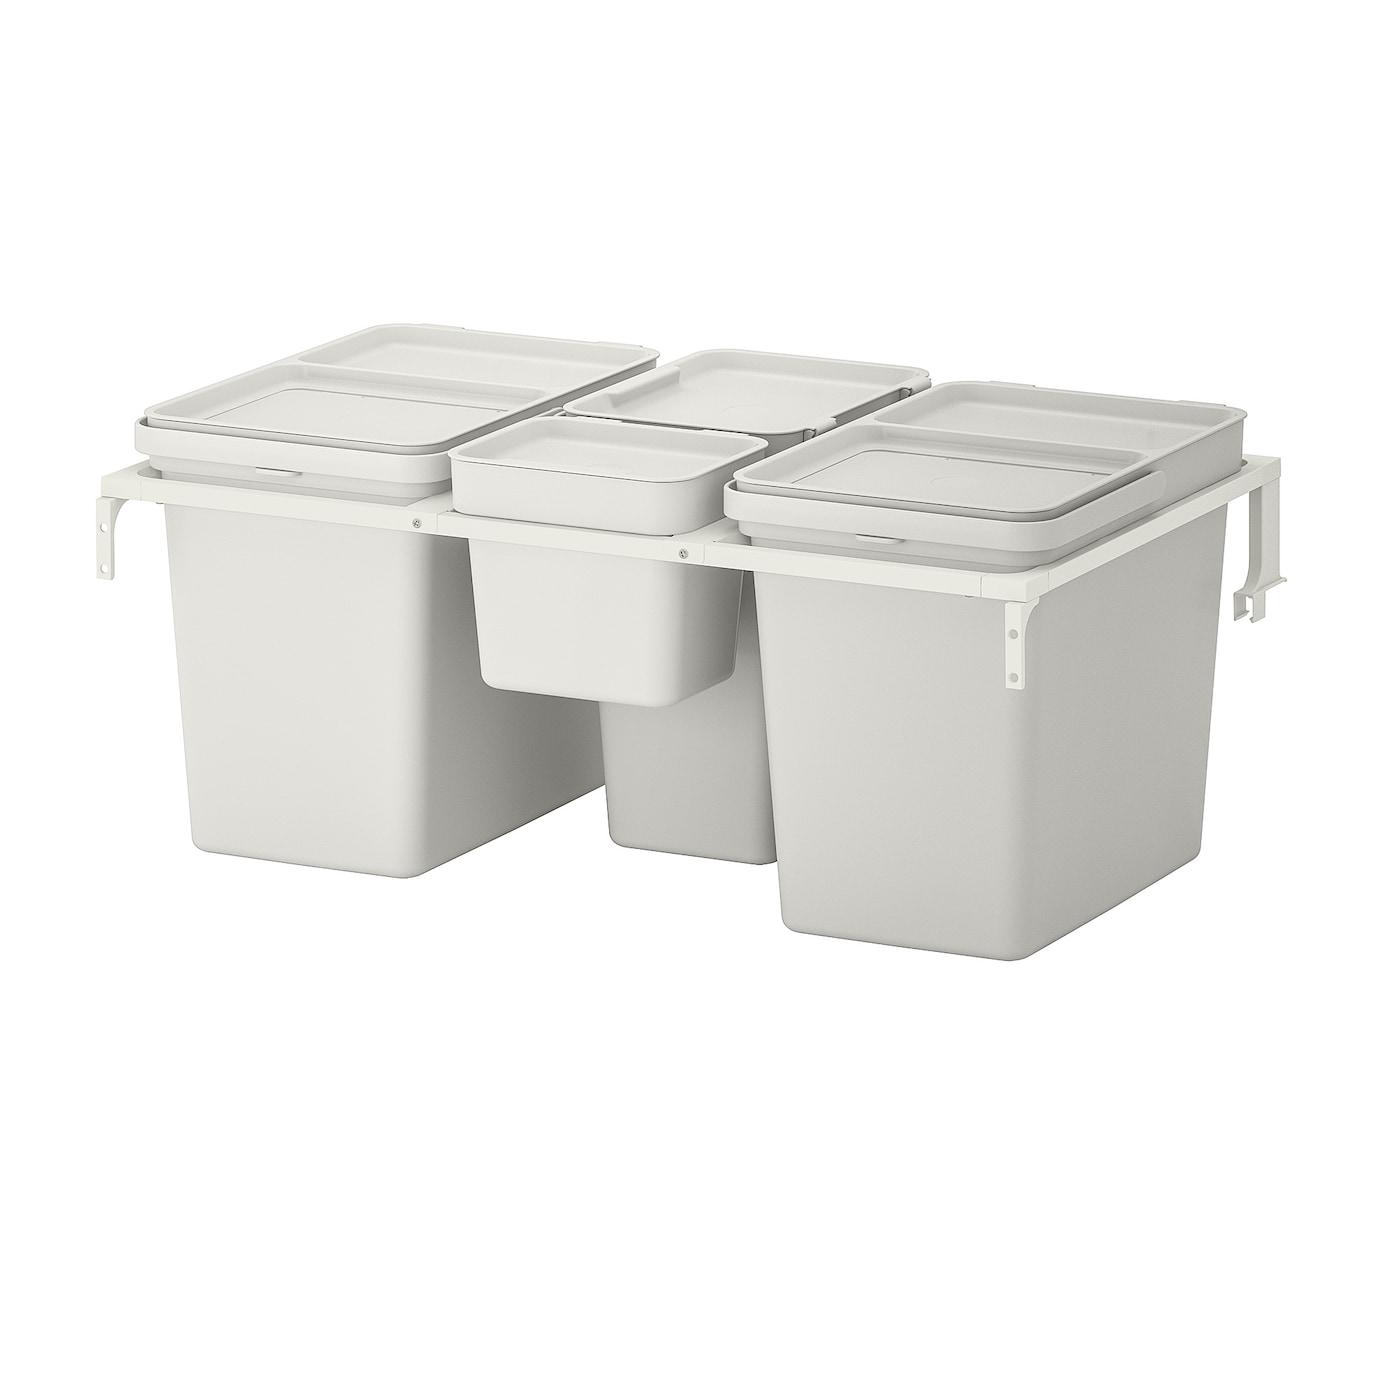 Armadio Raccolta Differenziata Ikea.Hallbar Soluzione Raccolta Differenziata Per Il Cassetto Della Cucina Metod Grigio Chiaro Ikea It